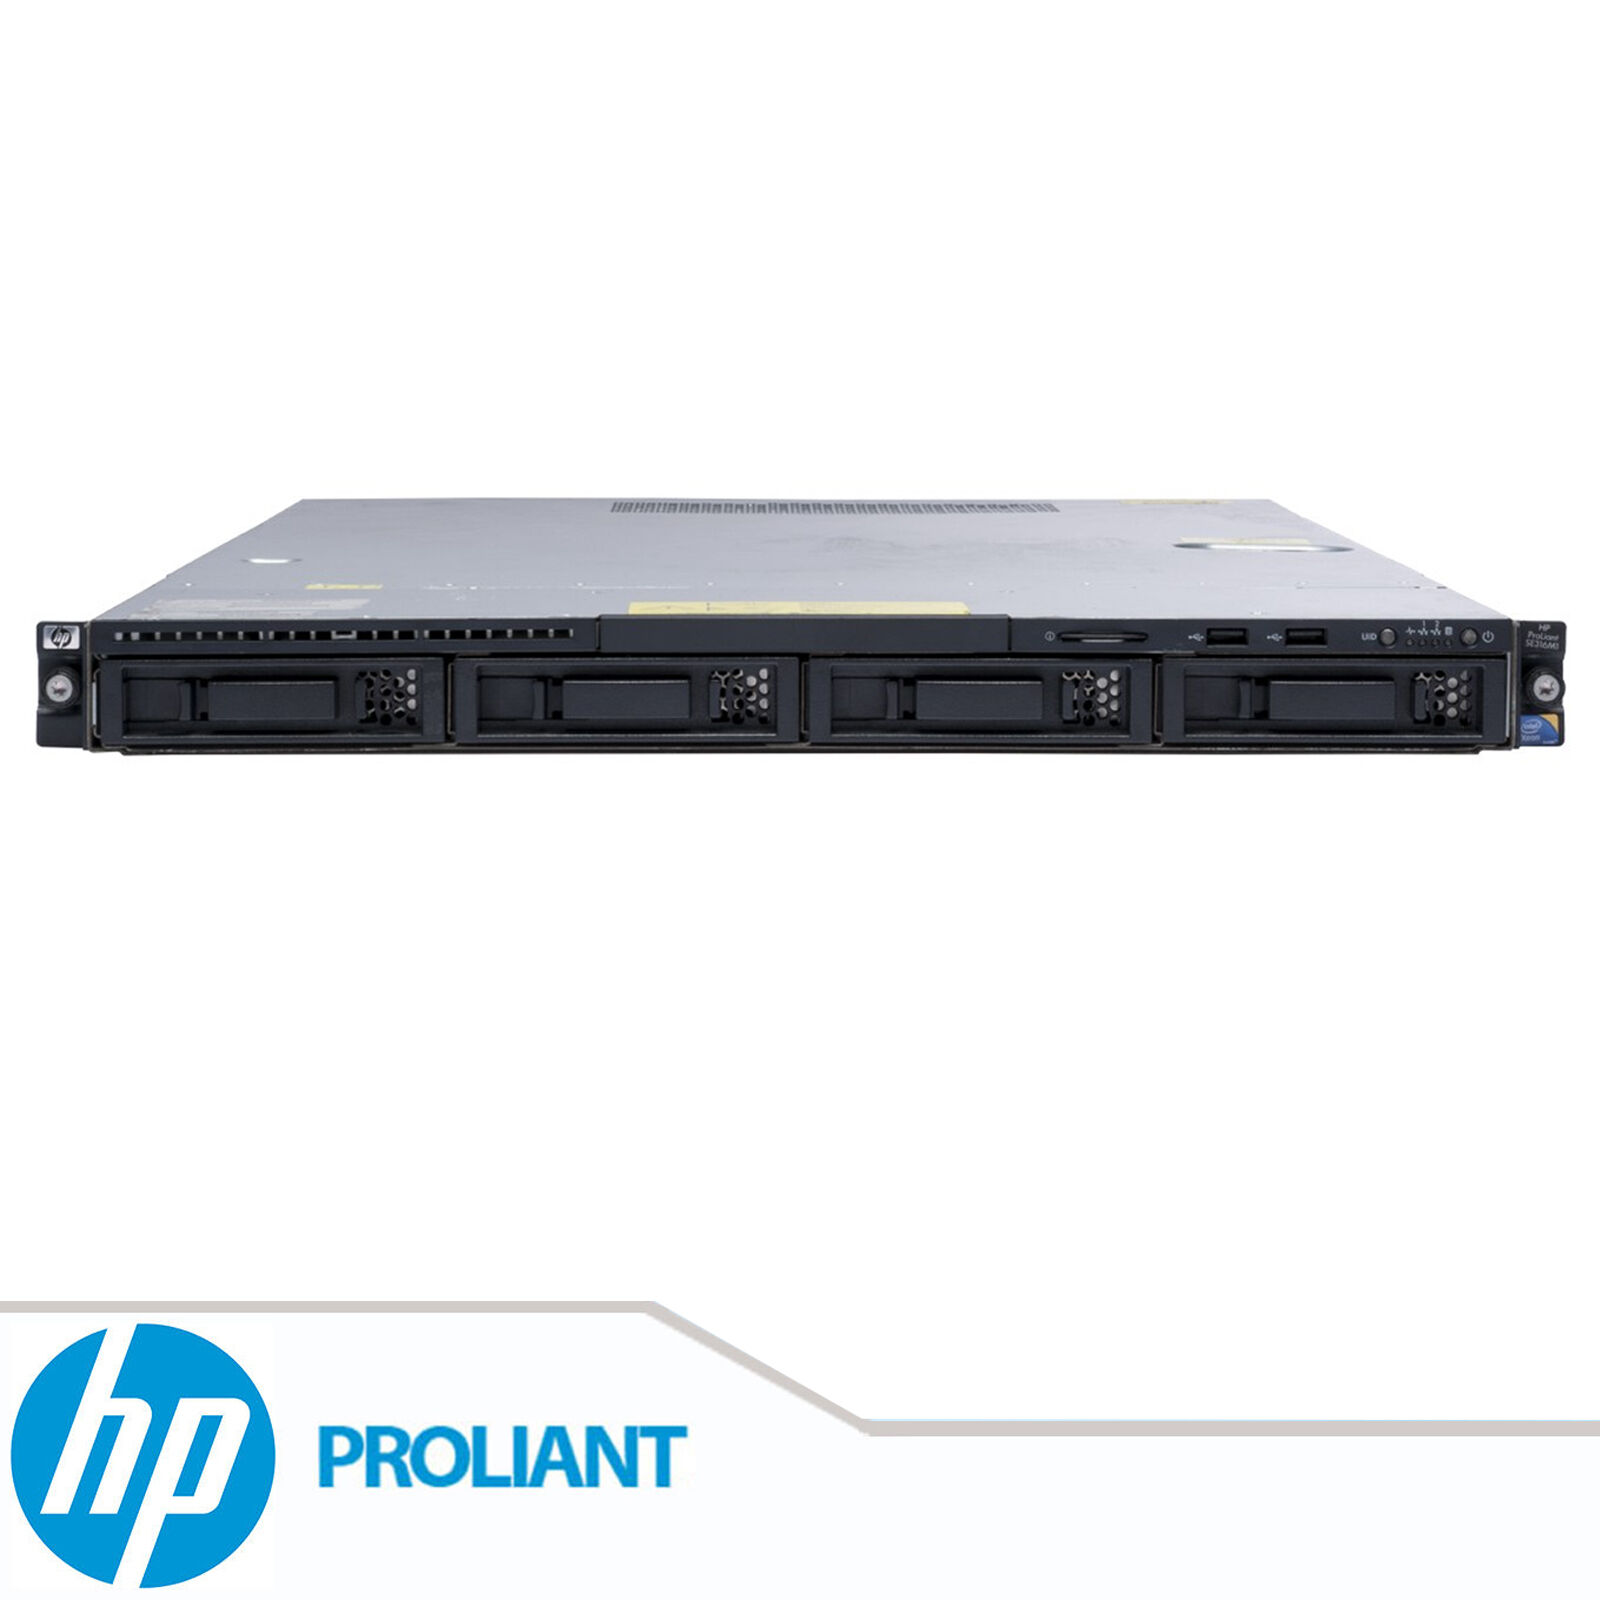 HP ProLiant DL160 G6 2x Xeon Quad Core E5506 8GB DDR3 RAM 1U Rackable Server